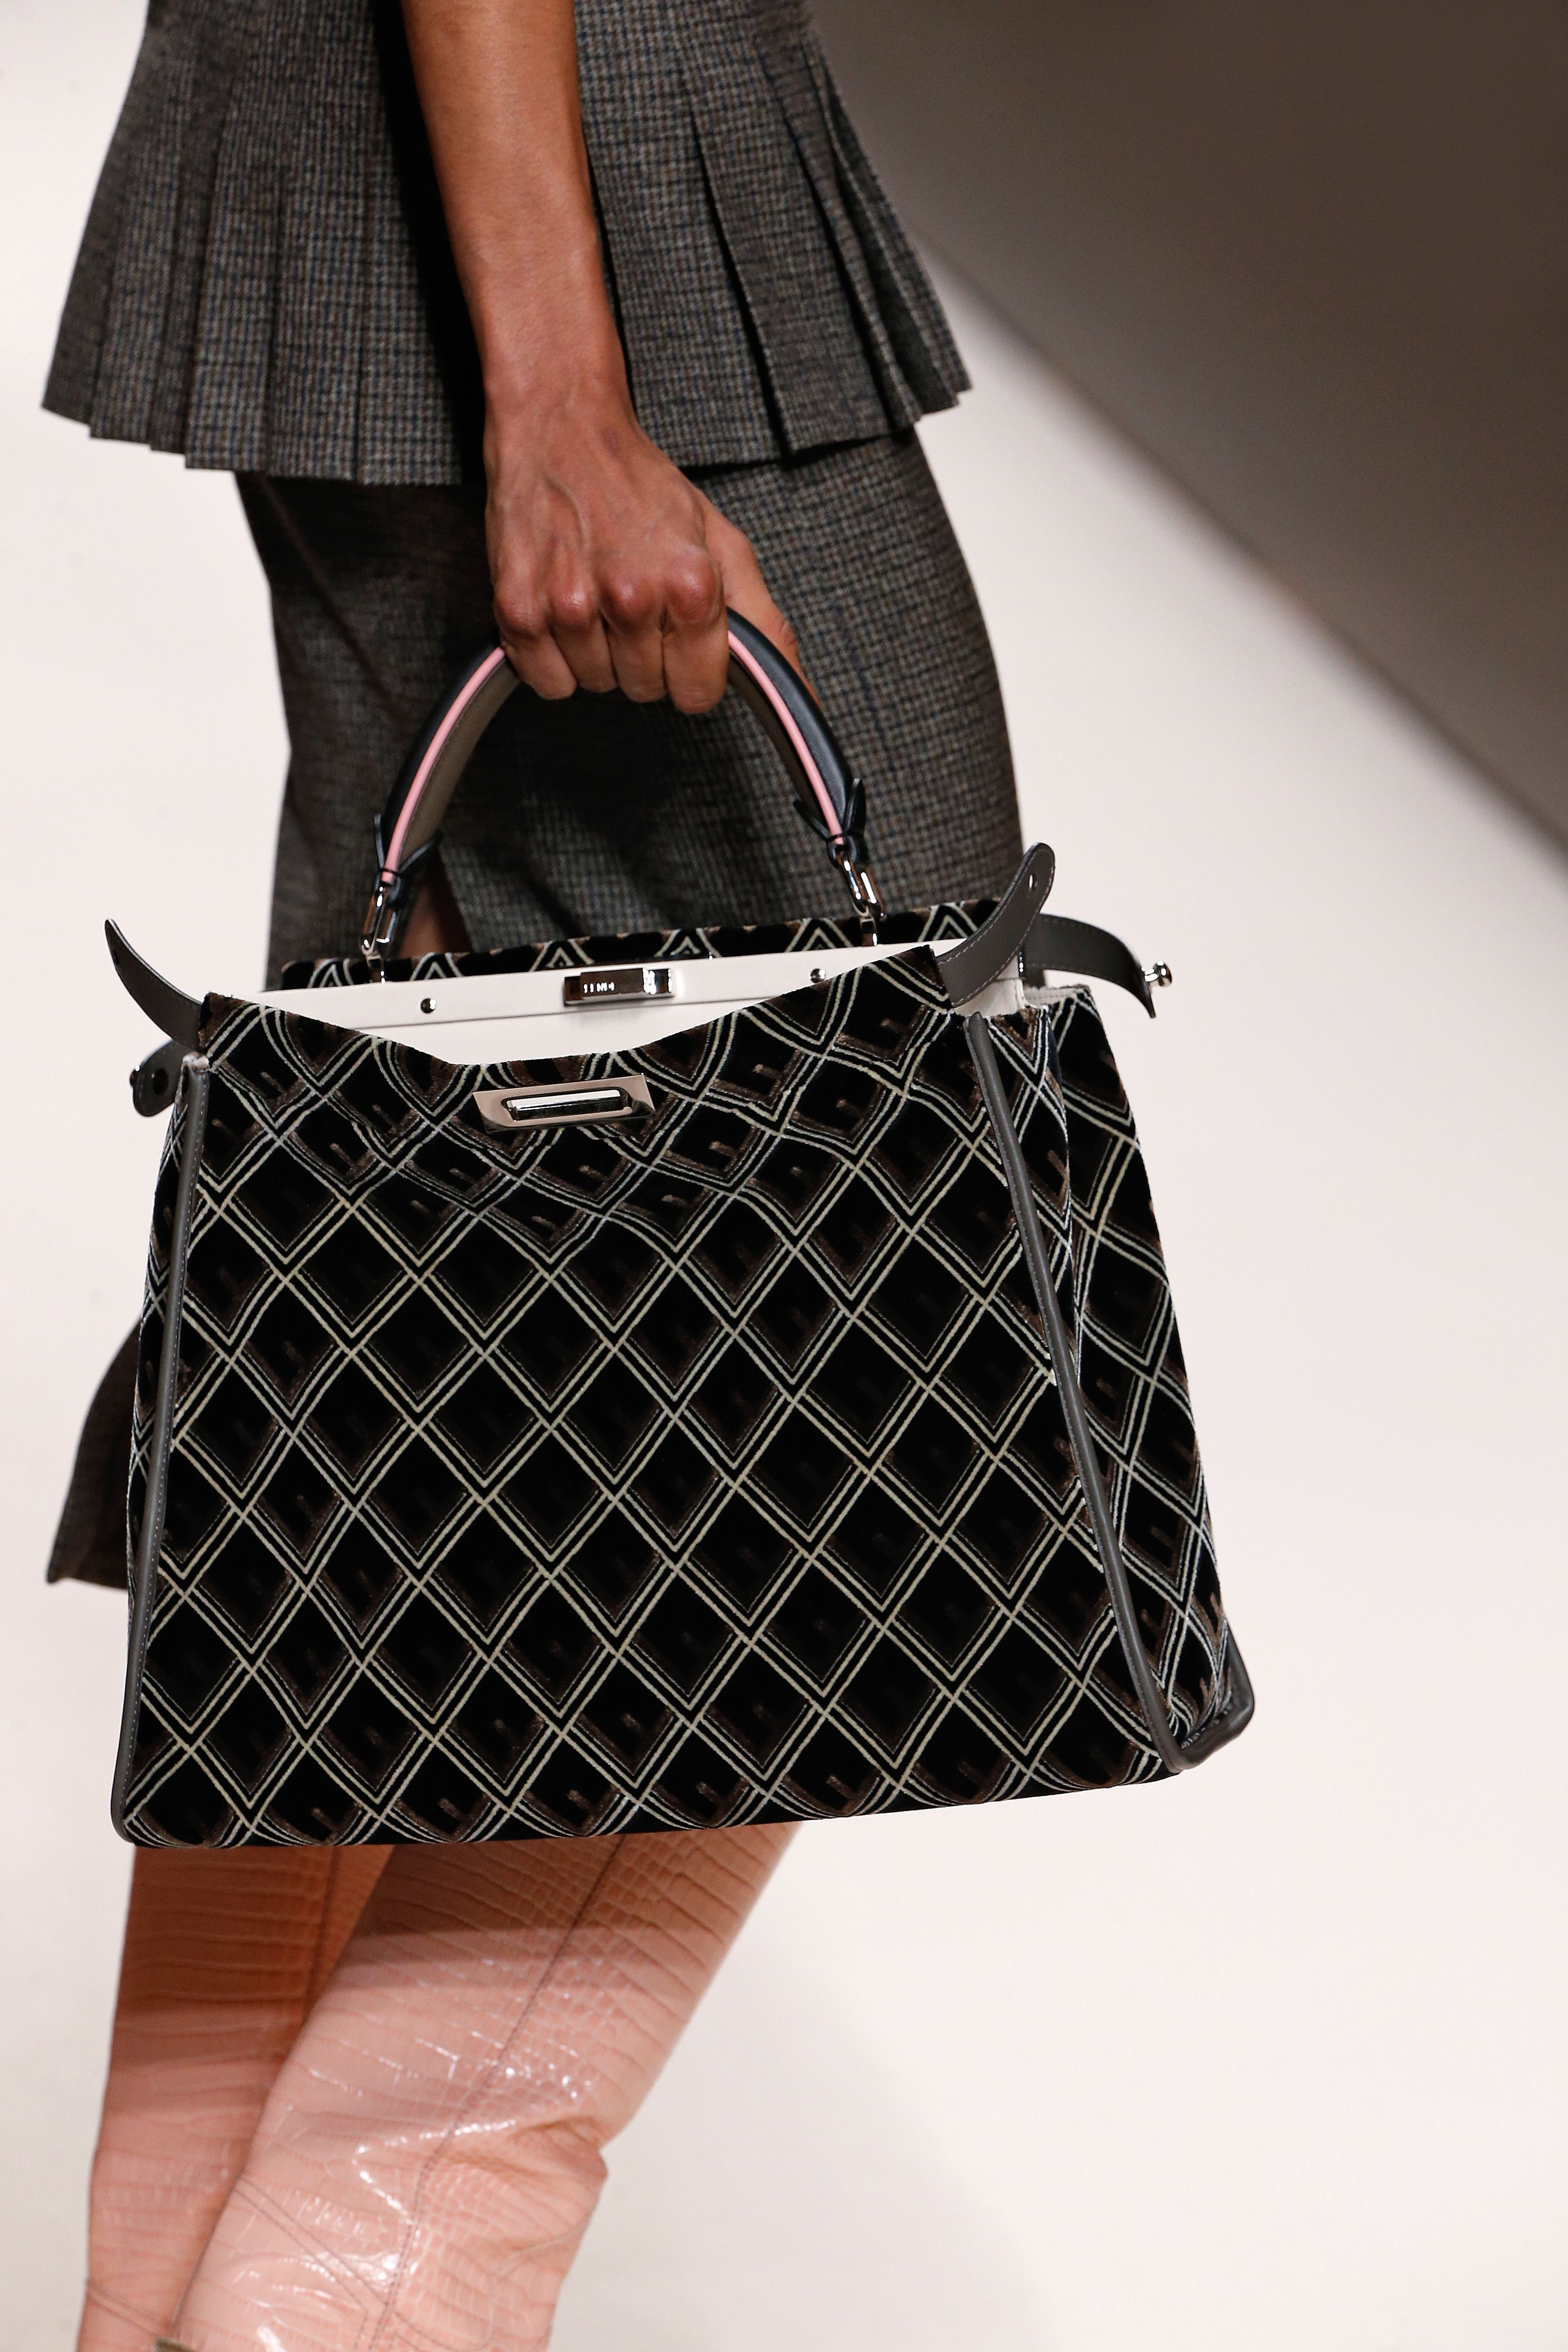 Fendi Fall Winter 2018-19 Fashion Show  7cb5258b9cee5